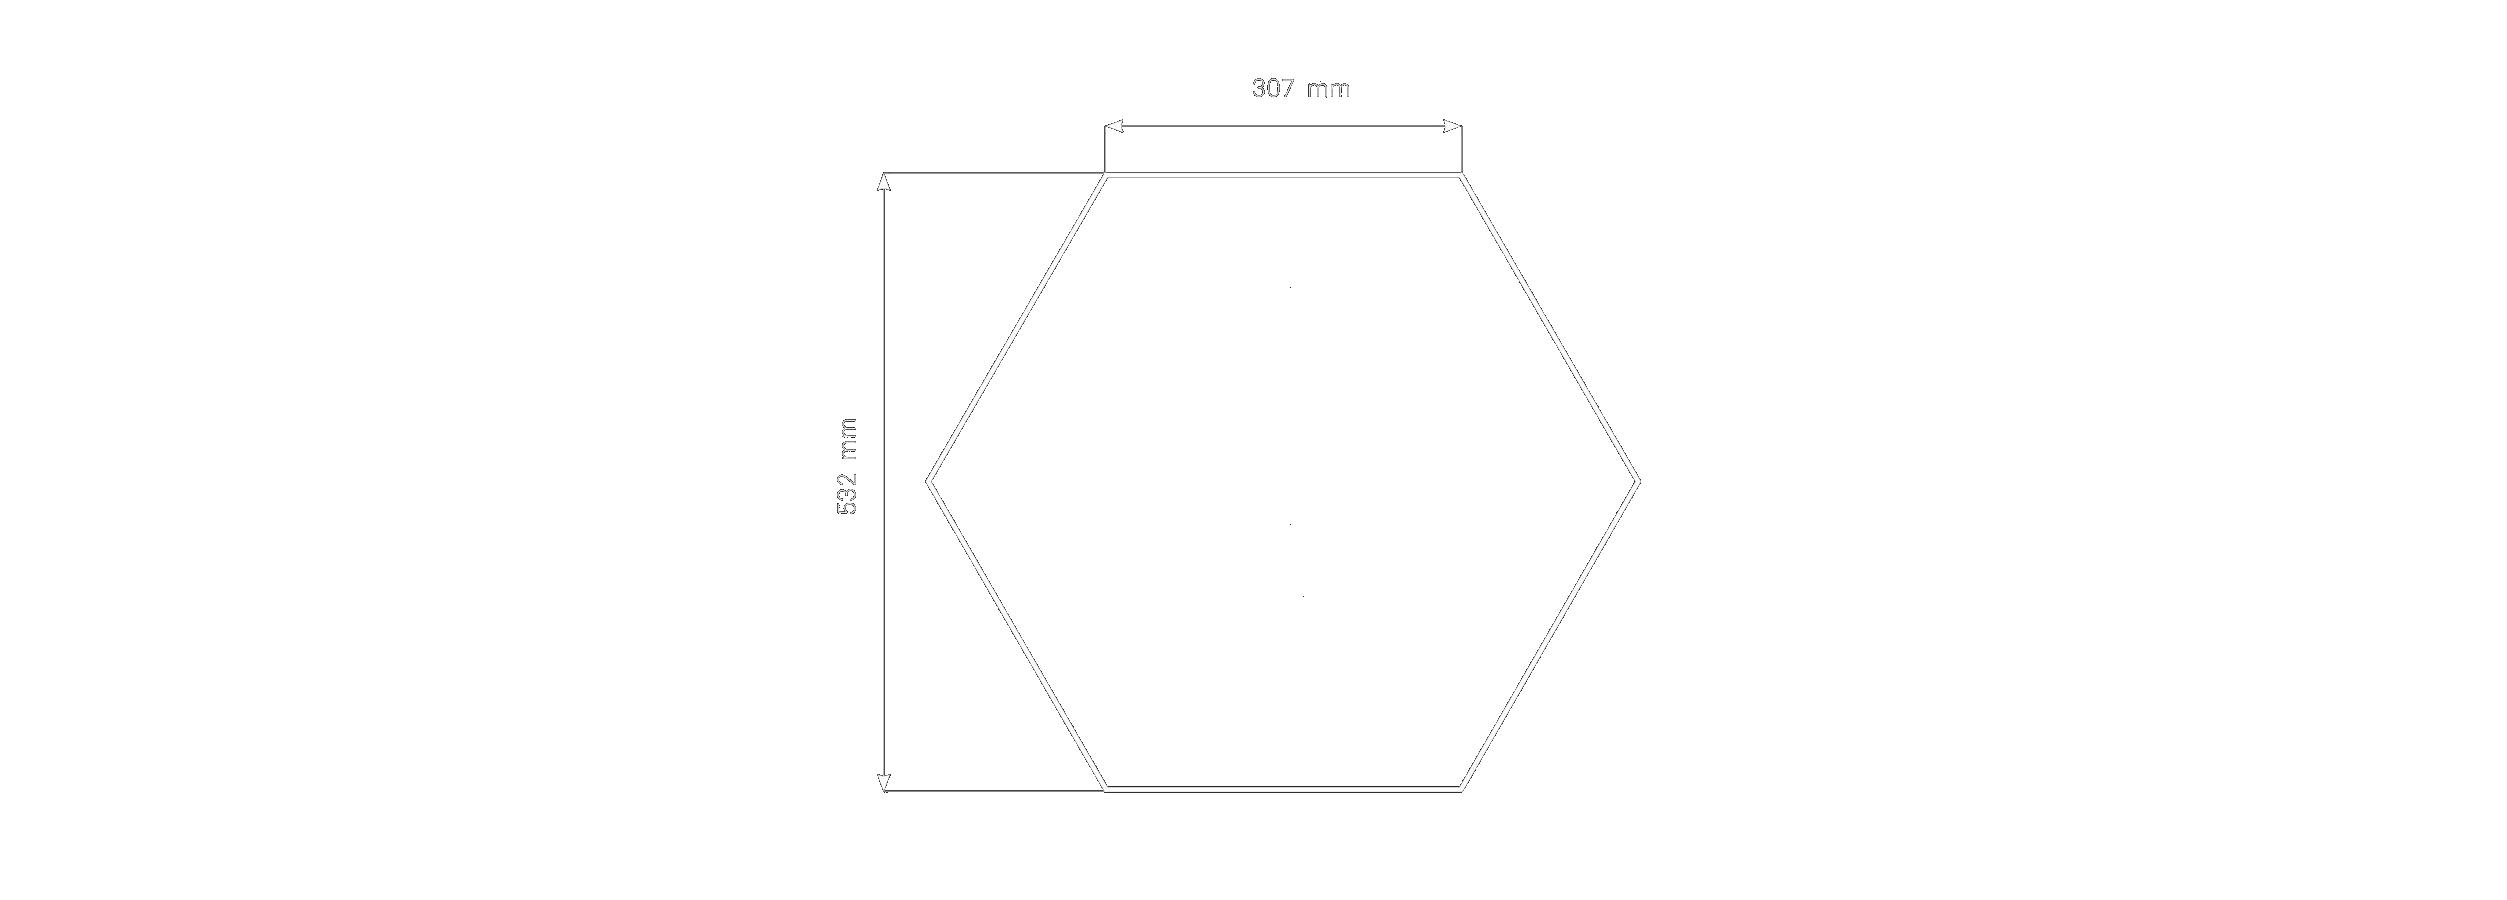 Hexagon Specifications